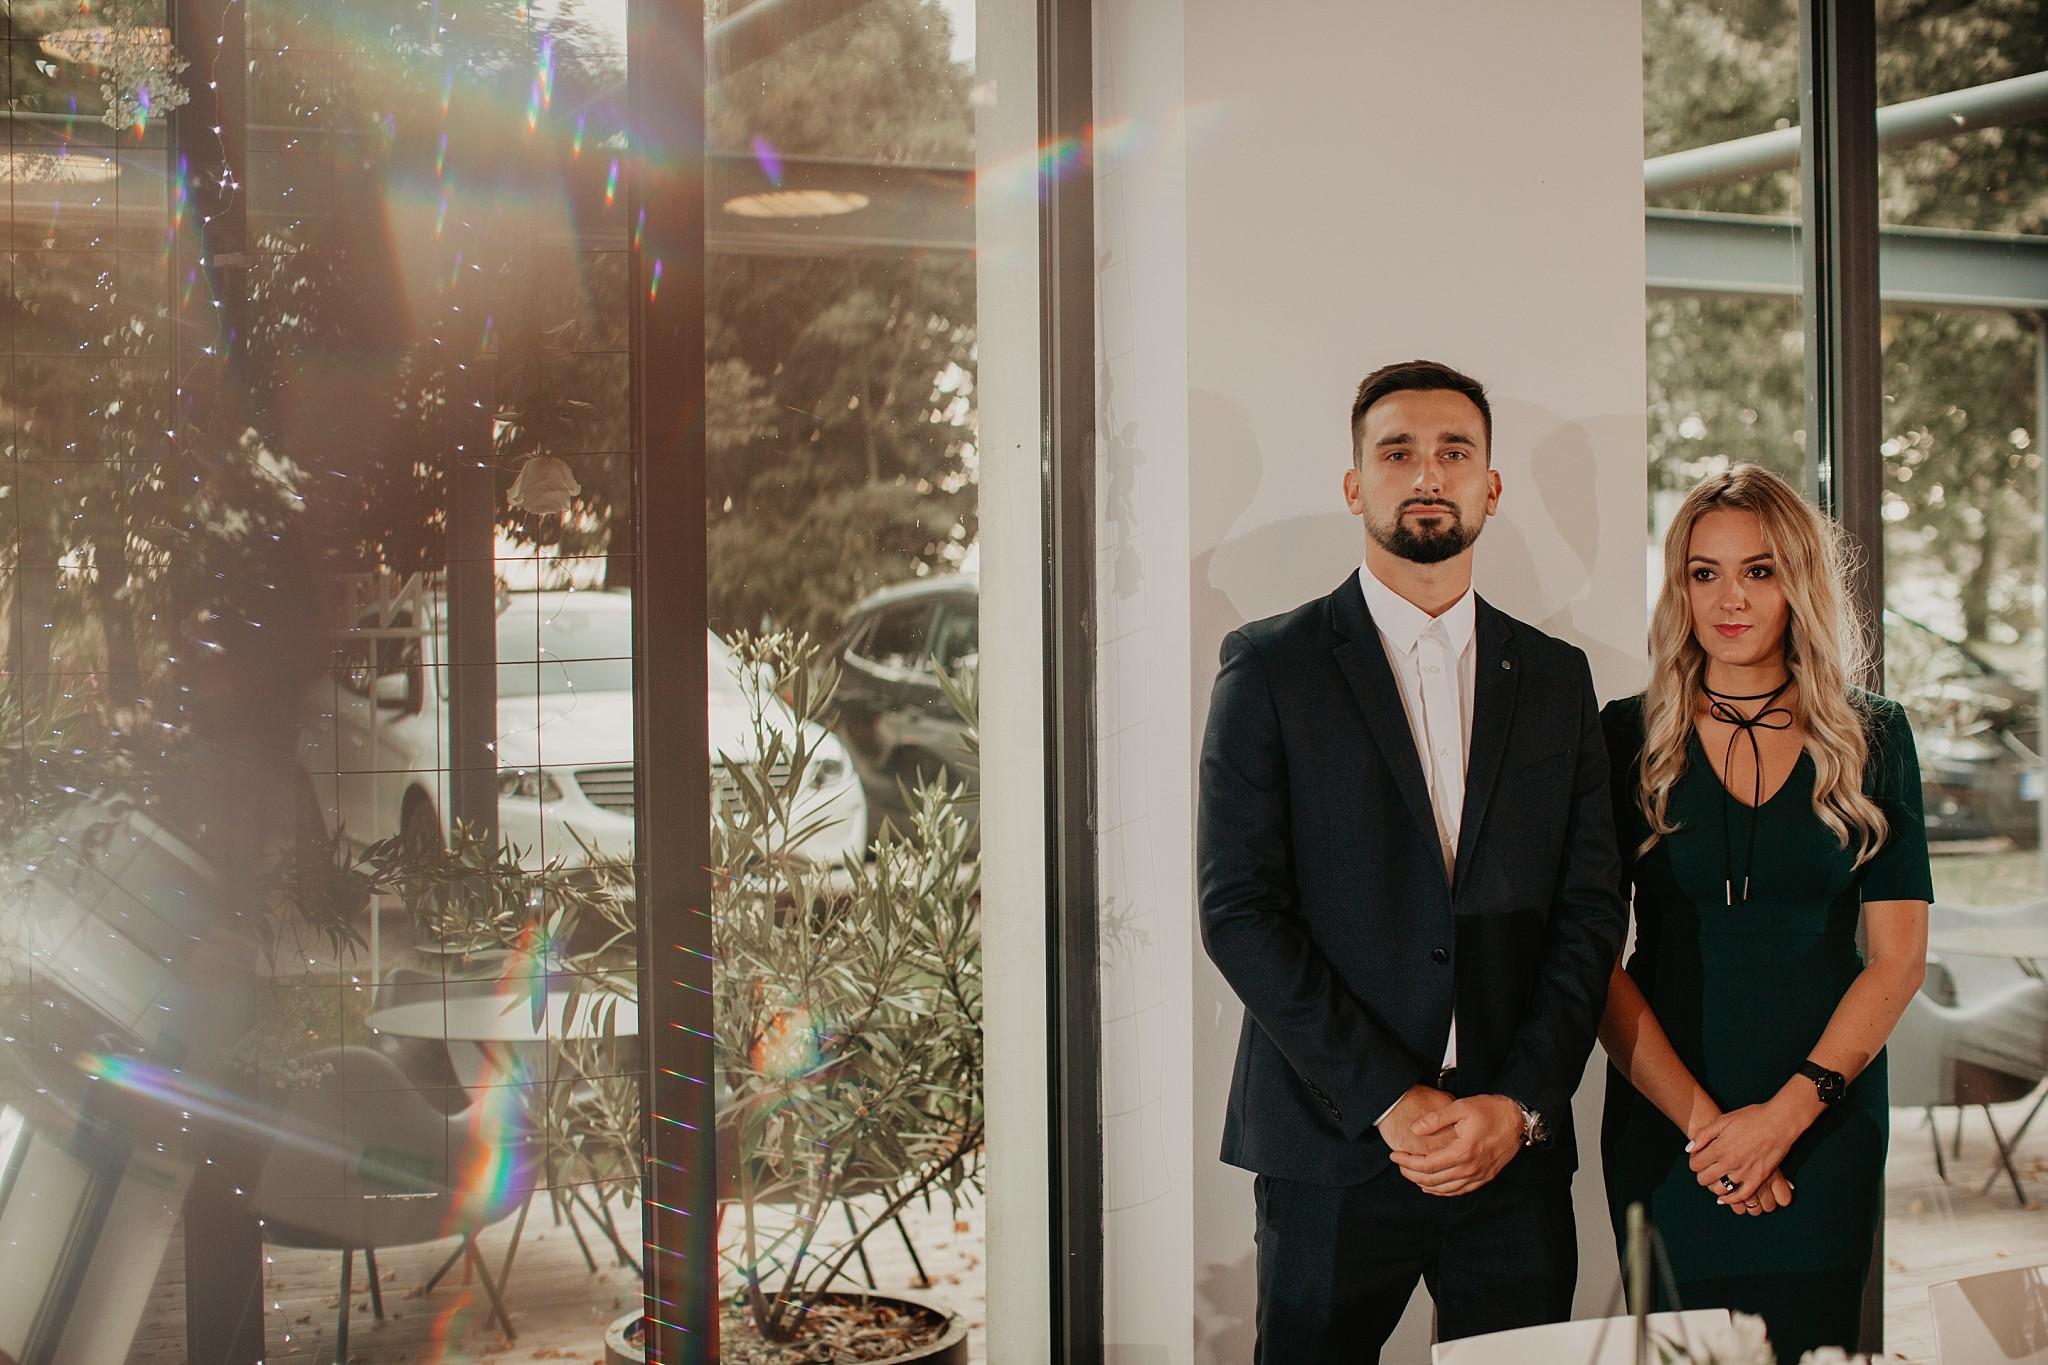 fotograf poznan wesele dobra truskawka piekne wesele pod poznaniem wesele w dobrej truskawce piekna para mloda slub marzen slub koronawirus slub listopad wesele koronawirus 280